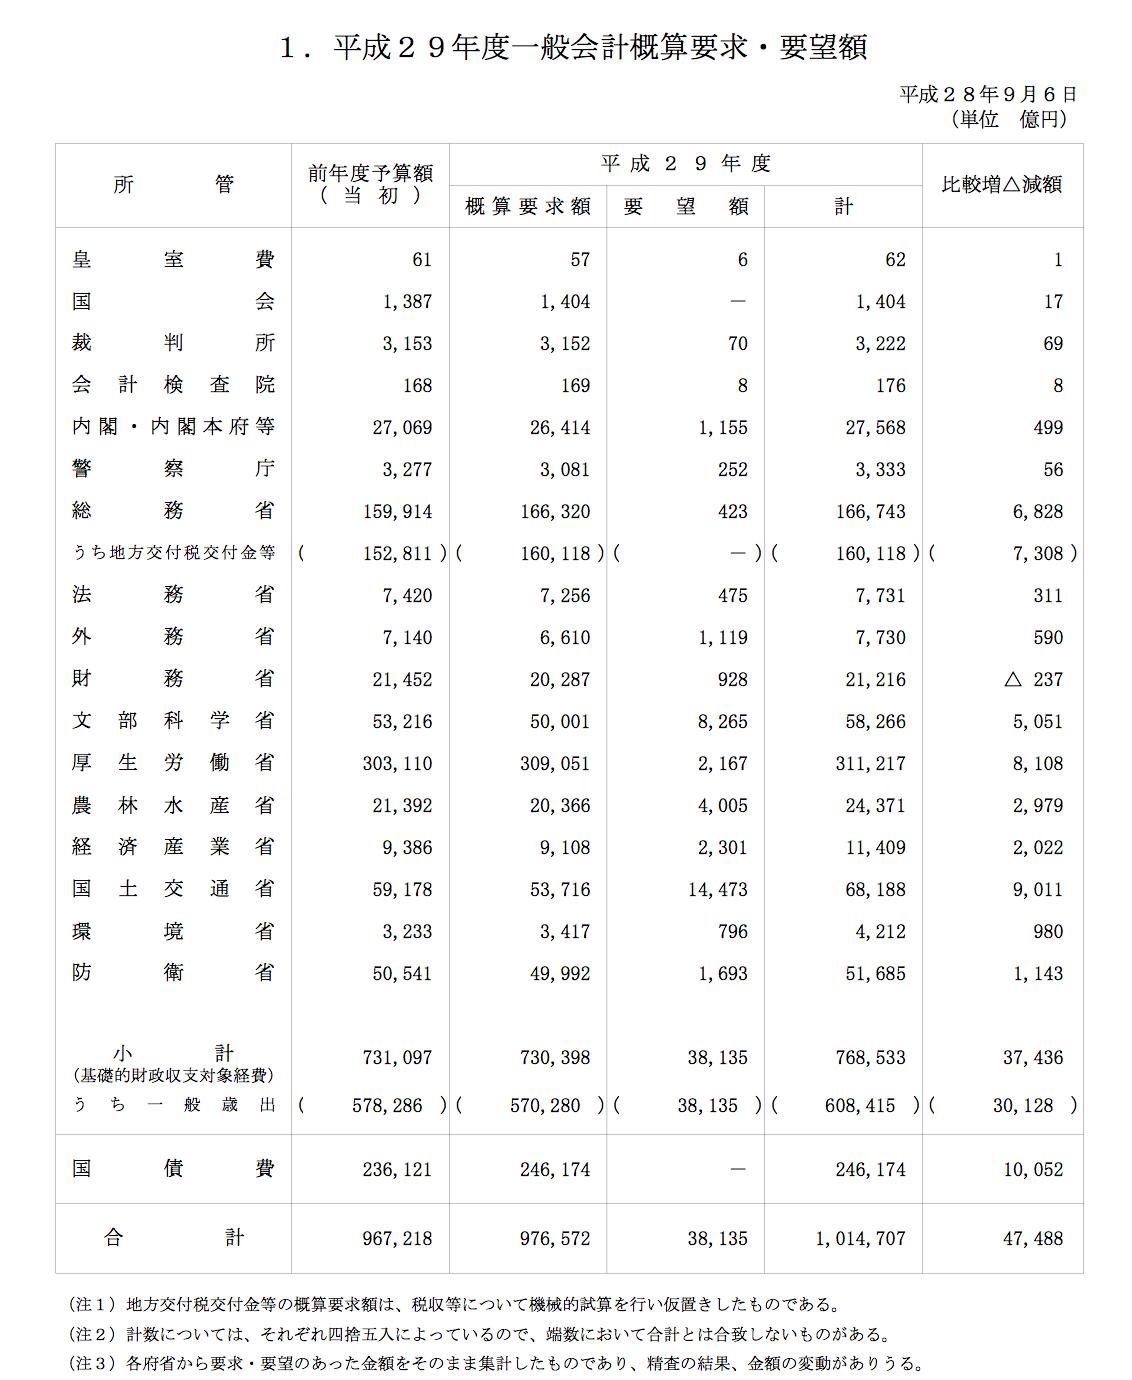 %e3%82%b9%e3%82%af%e3%83%aa%e3%83%bc%e3%83%b3%e3%82%b7%e3%83%a7%e3%83%83%e3%83%88-2016-12-23-14-10-46